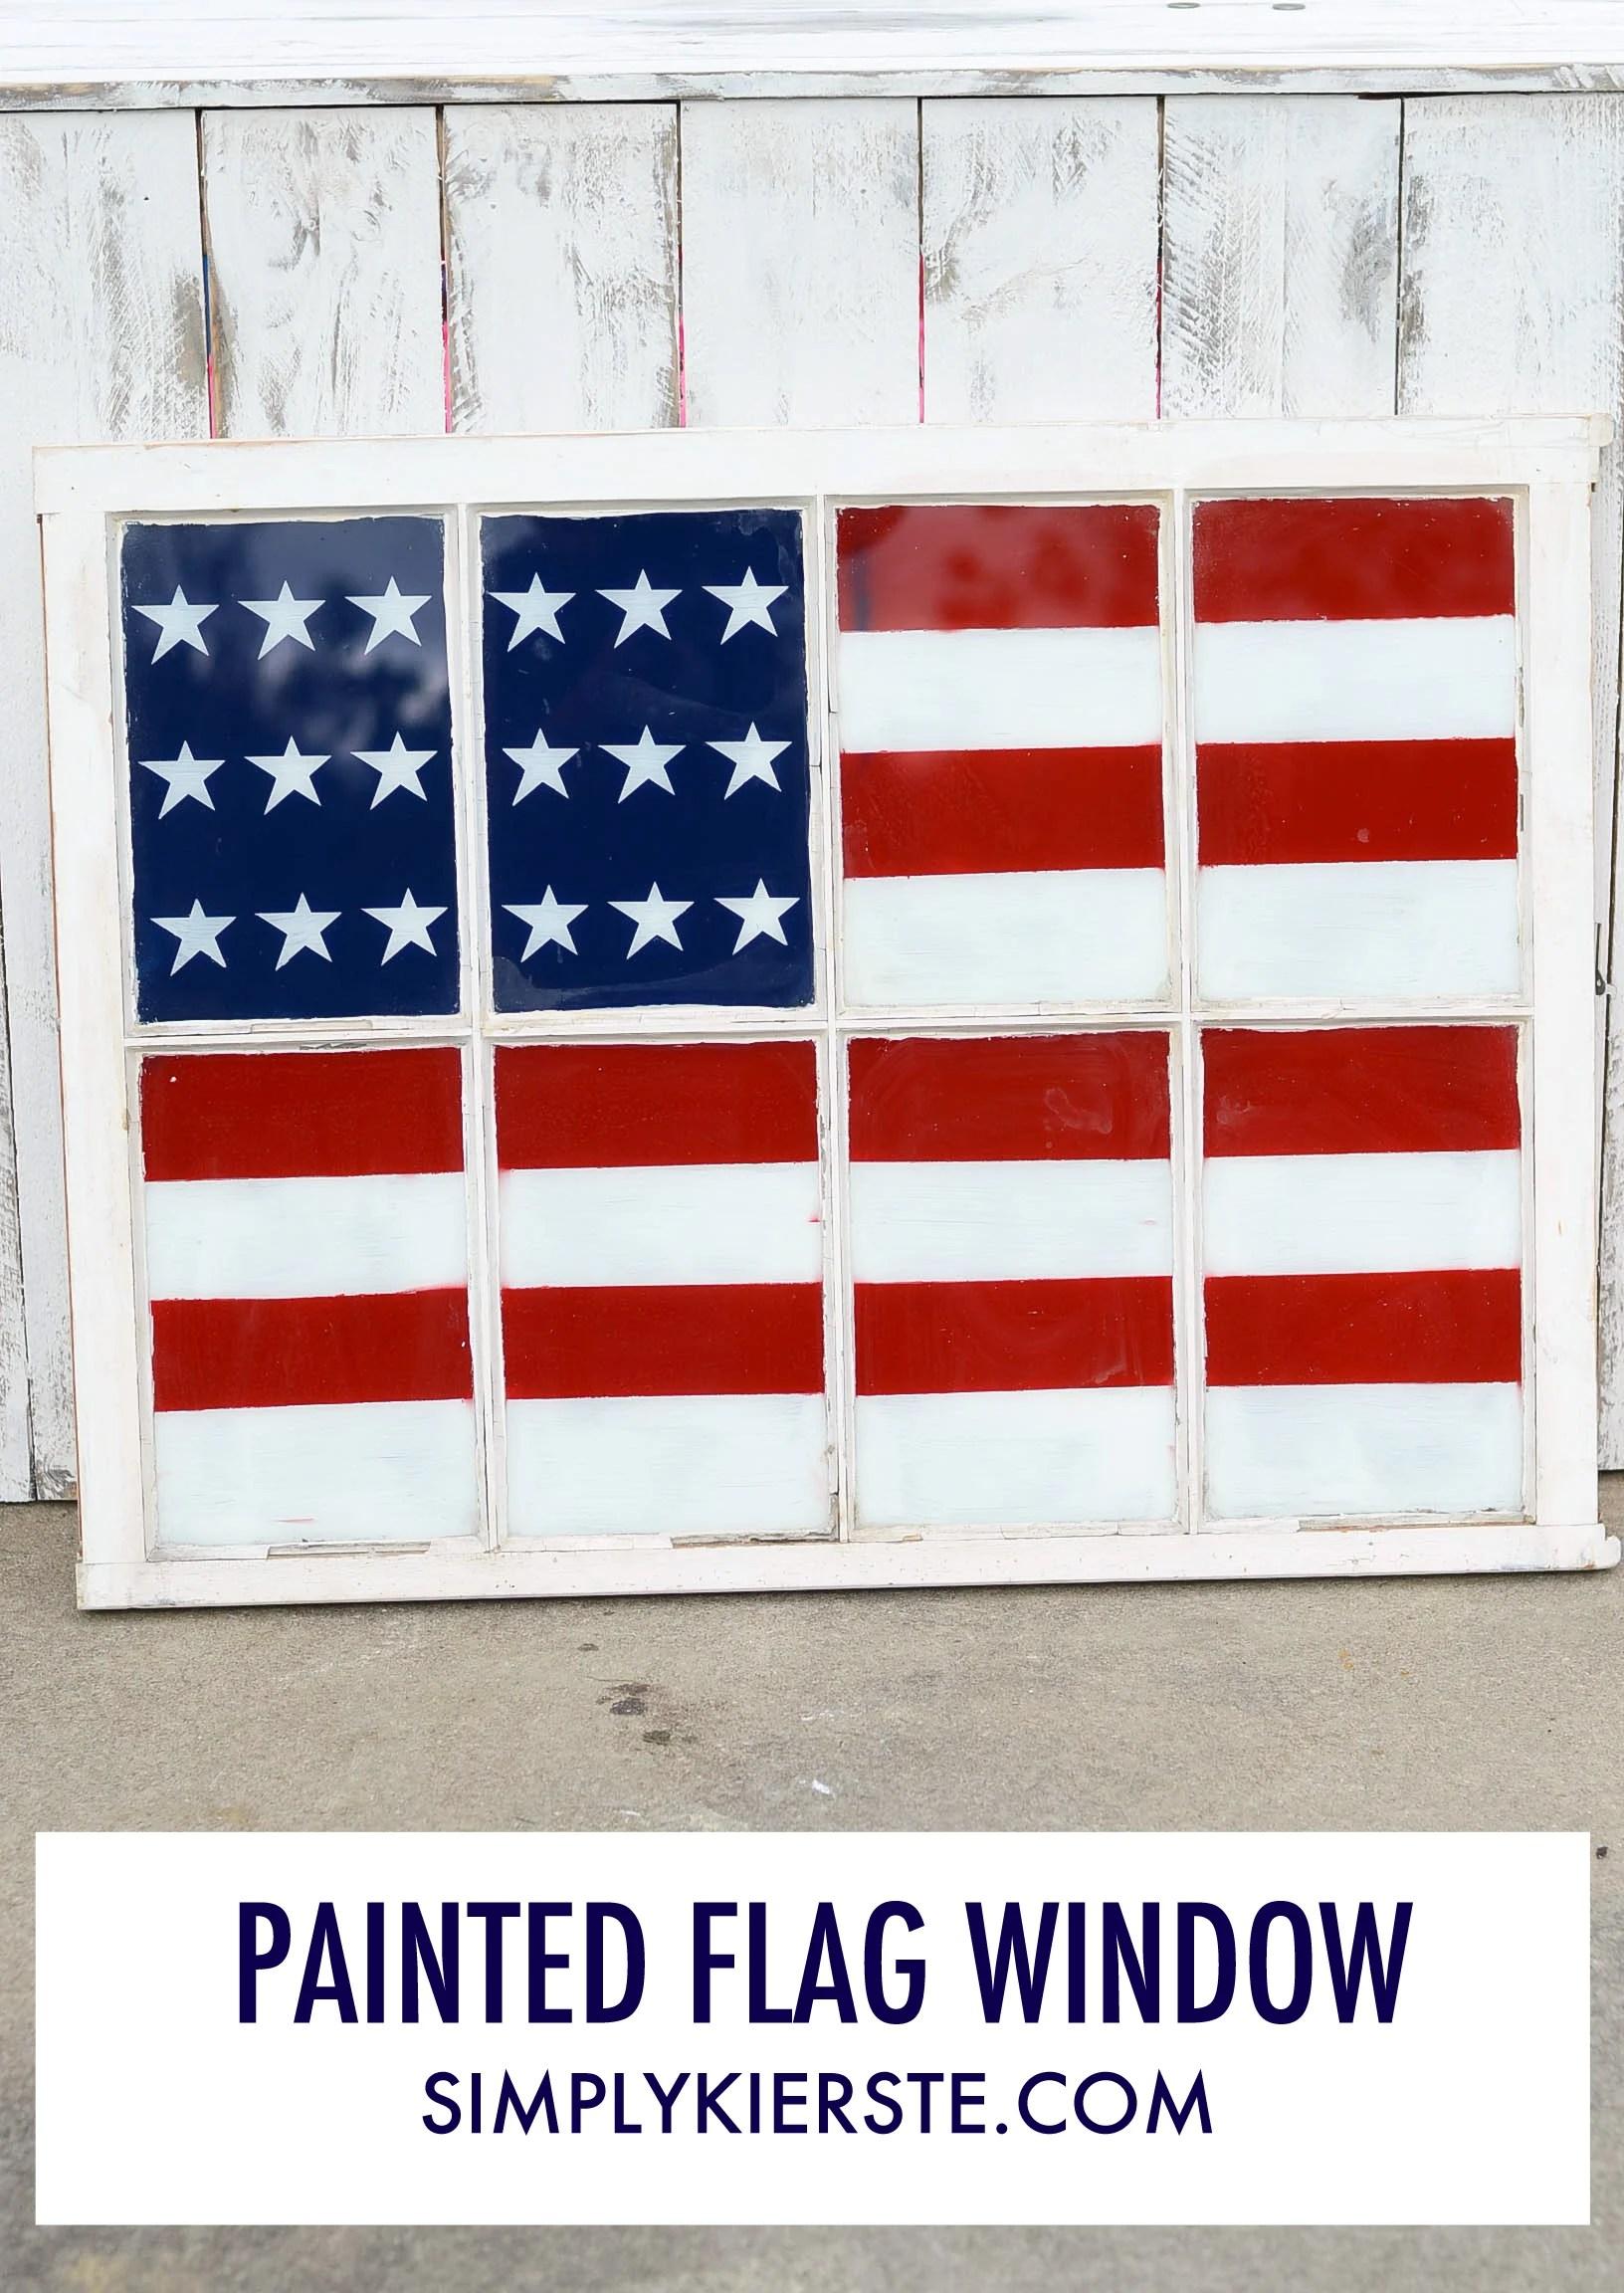 Painted Flag Window   4th of July   oldsaltfarm.com